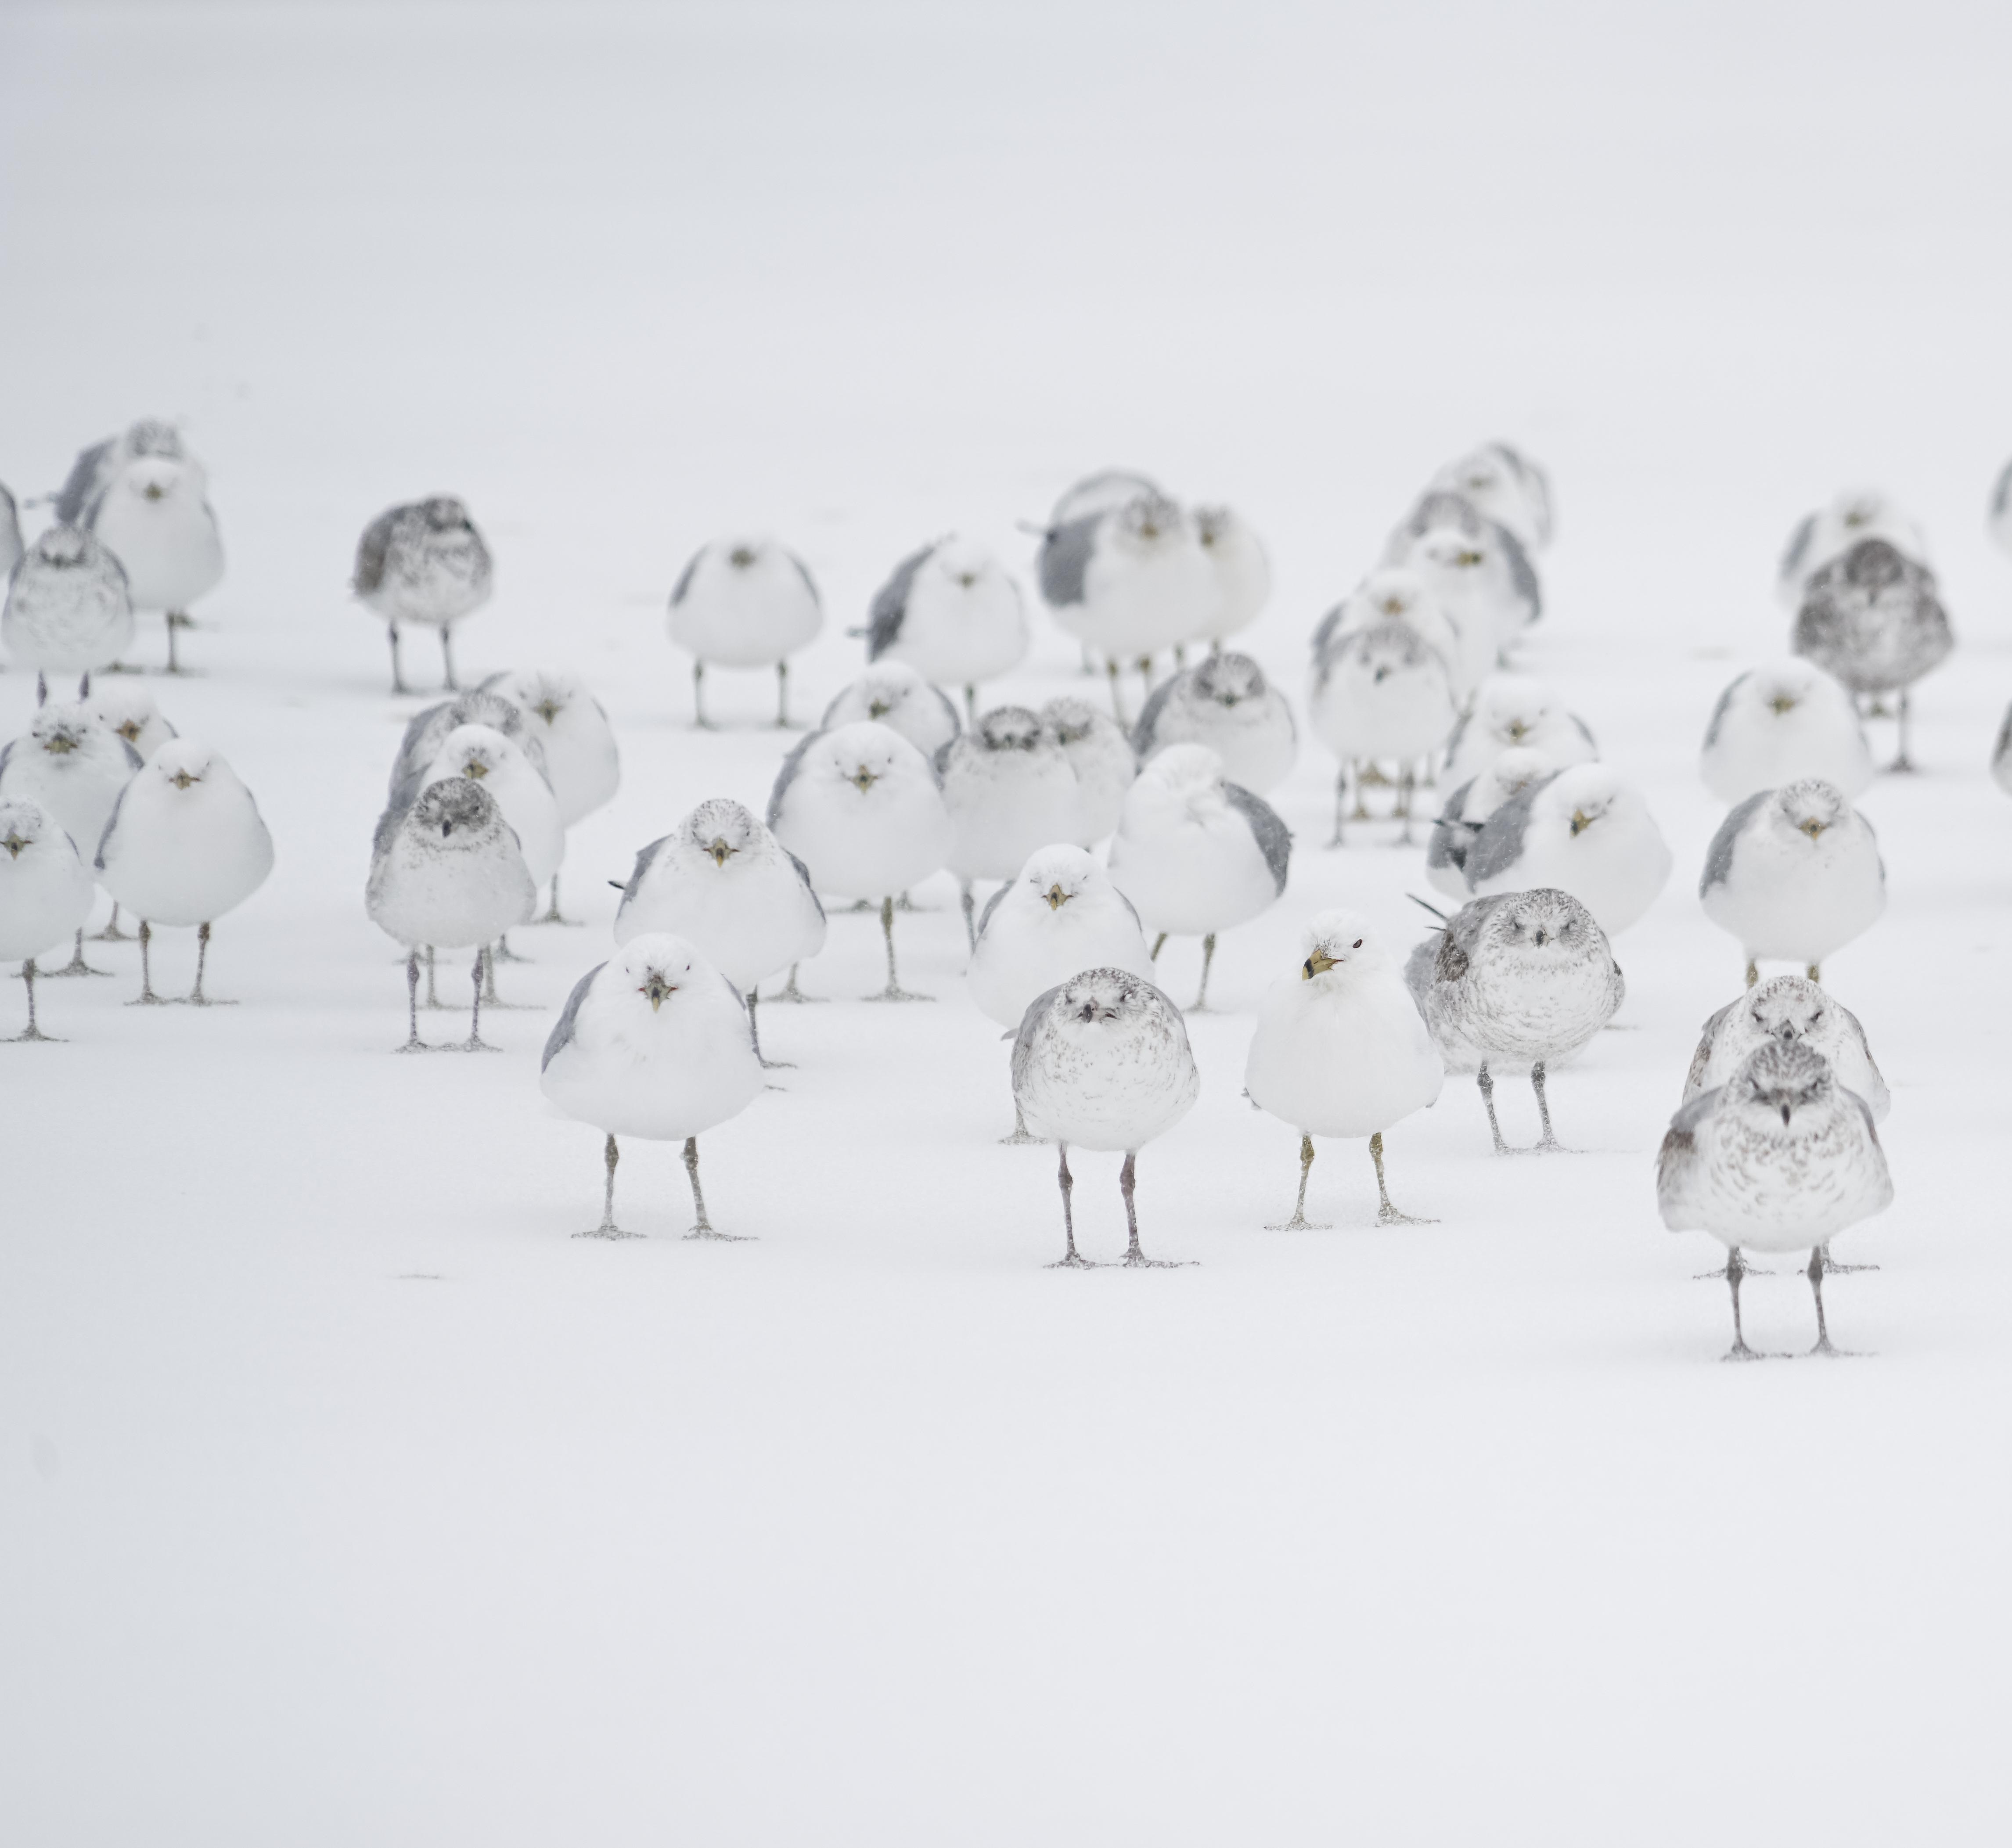 Gambar Putih Sketsa Gambar Ilustrasi Burung Terbang